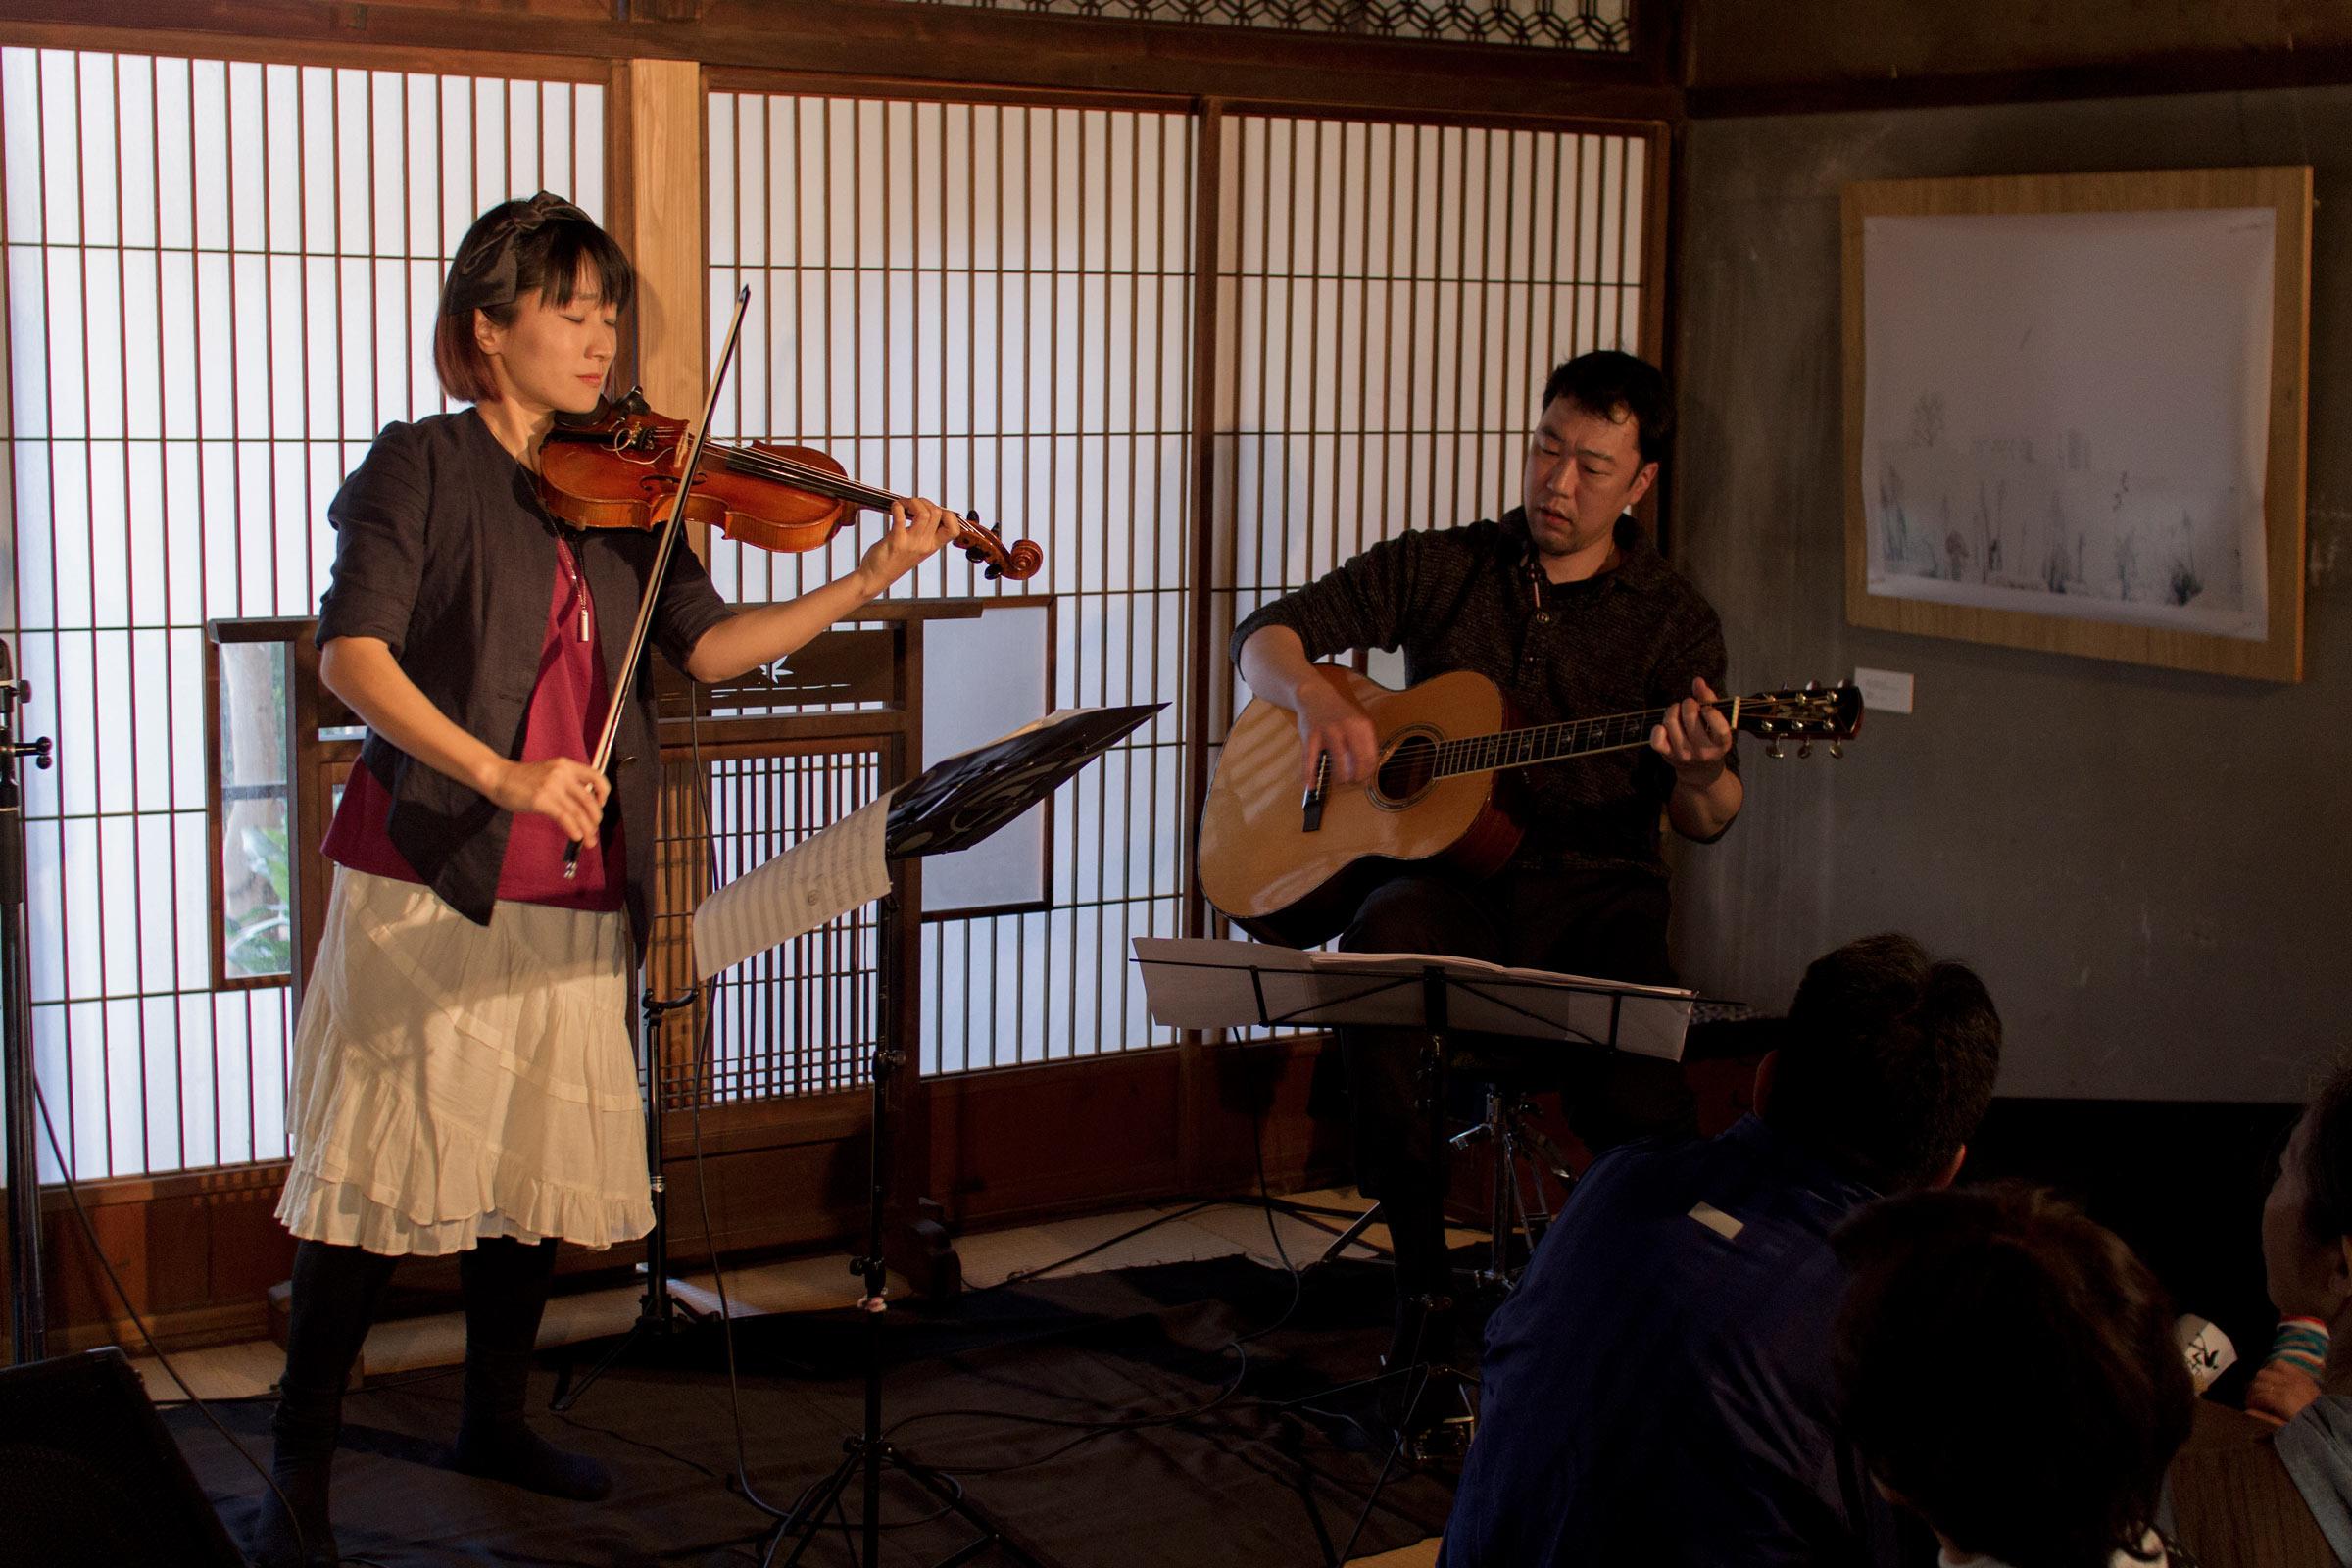 Koyama Rie Violin Concert Japan Onishi